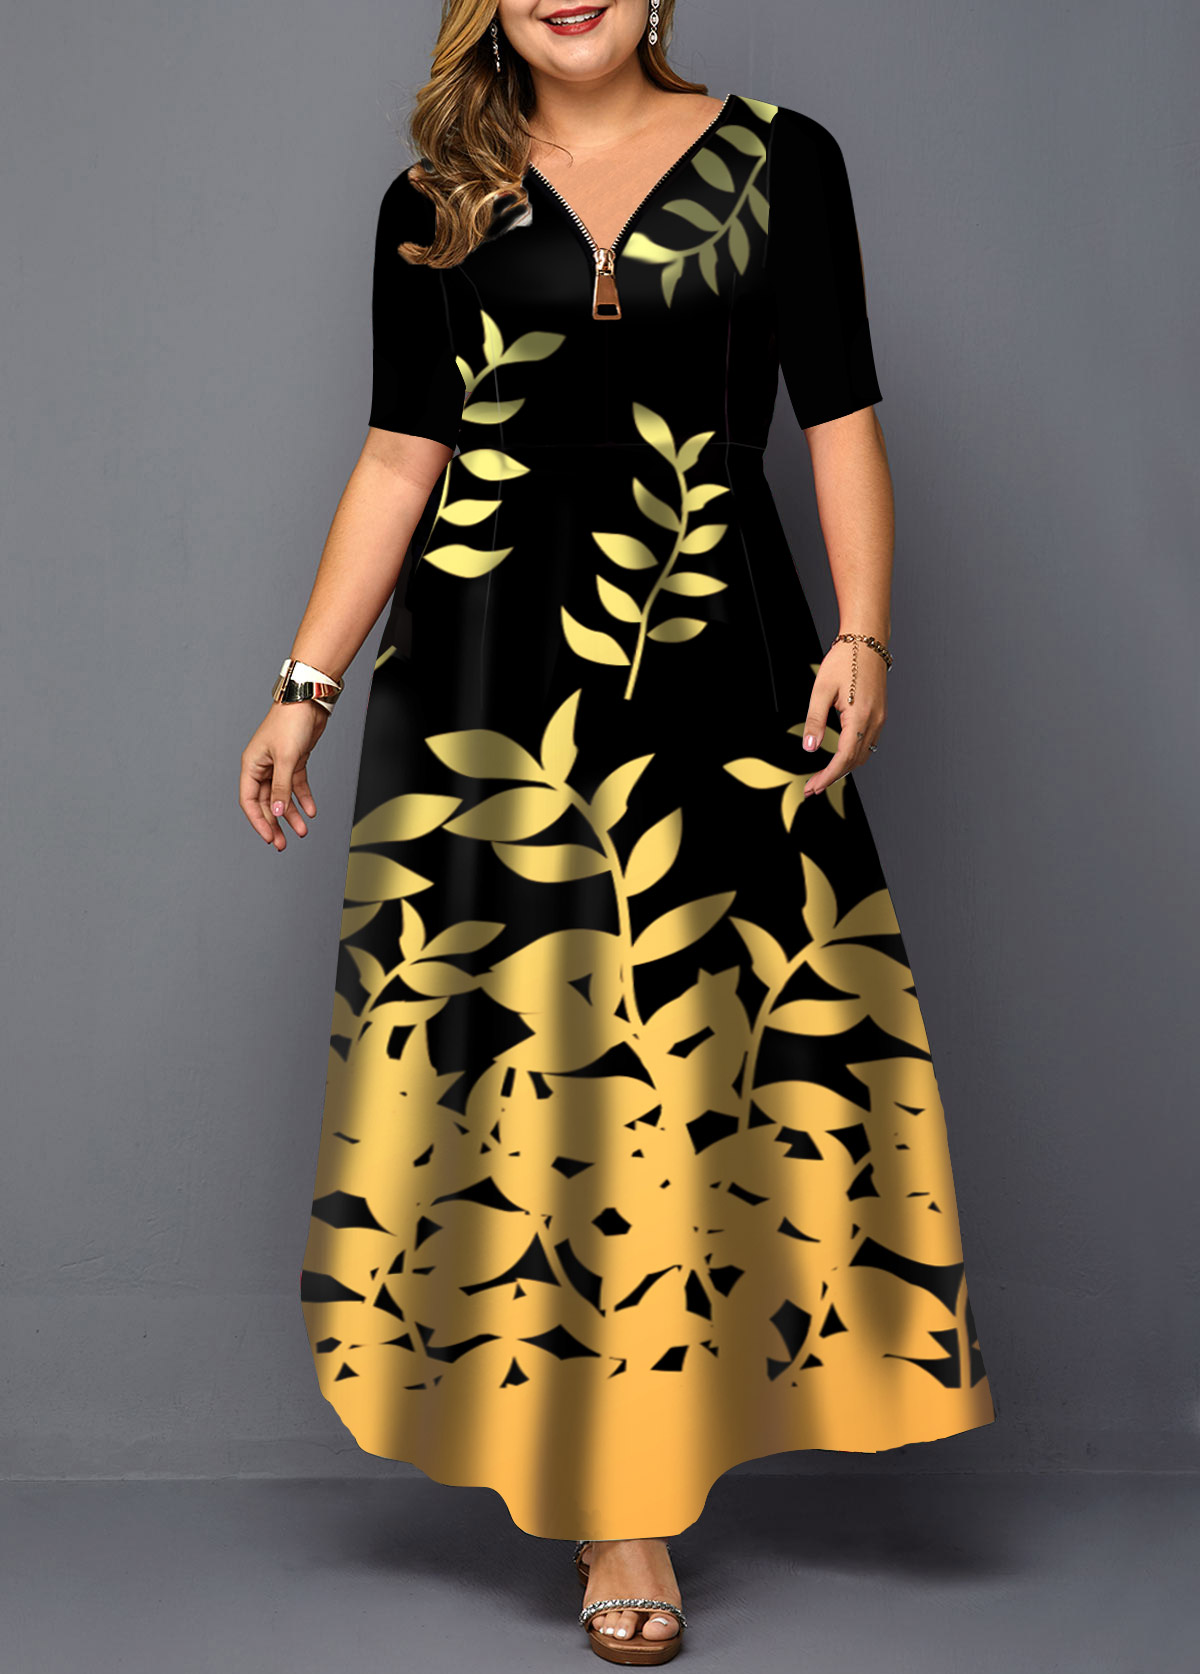 Leaf Print Zipper Detail Plus Size Maxi Dress